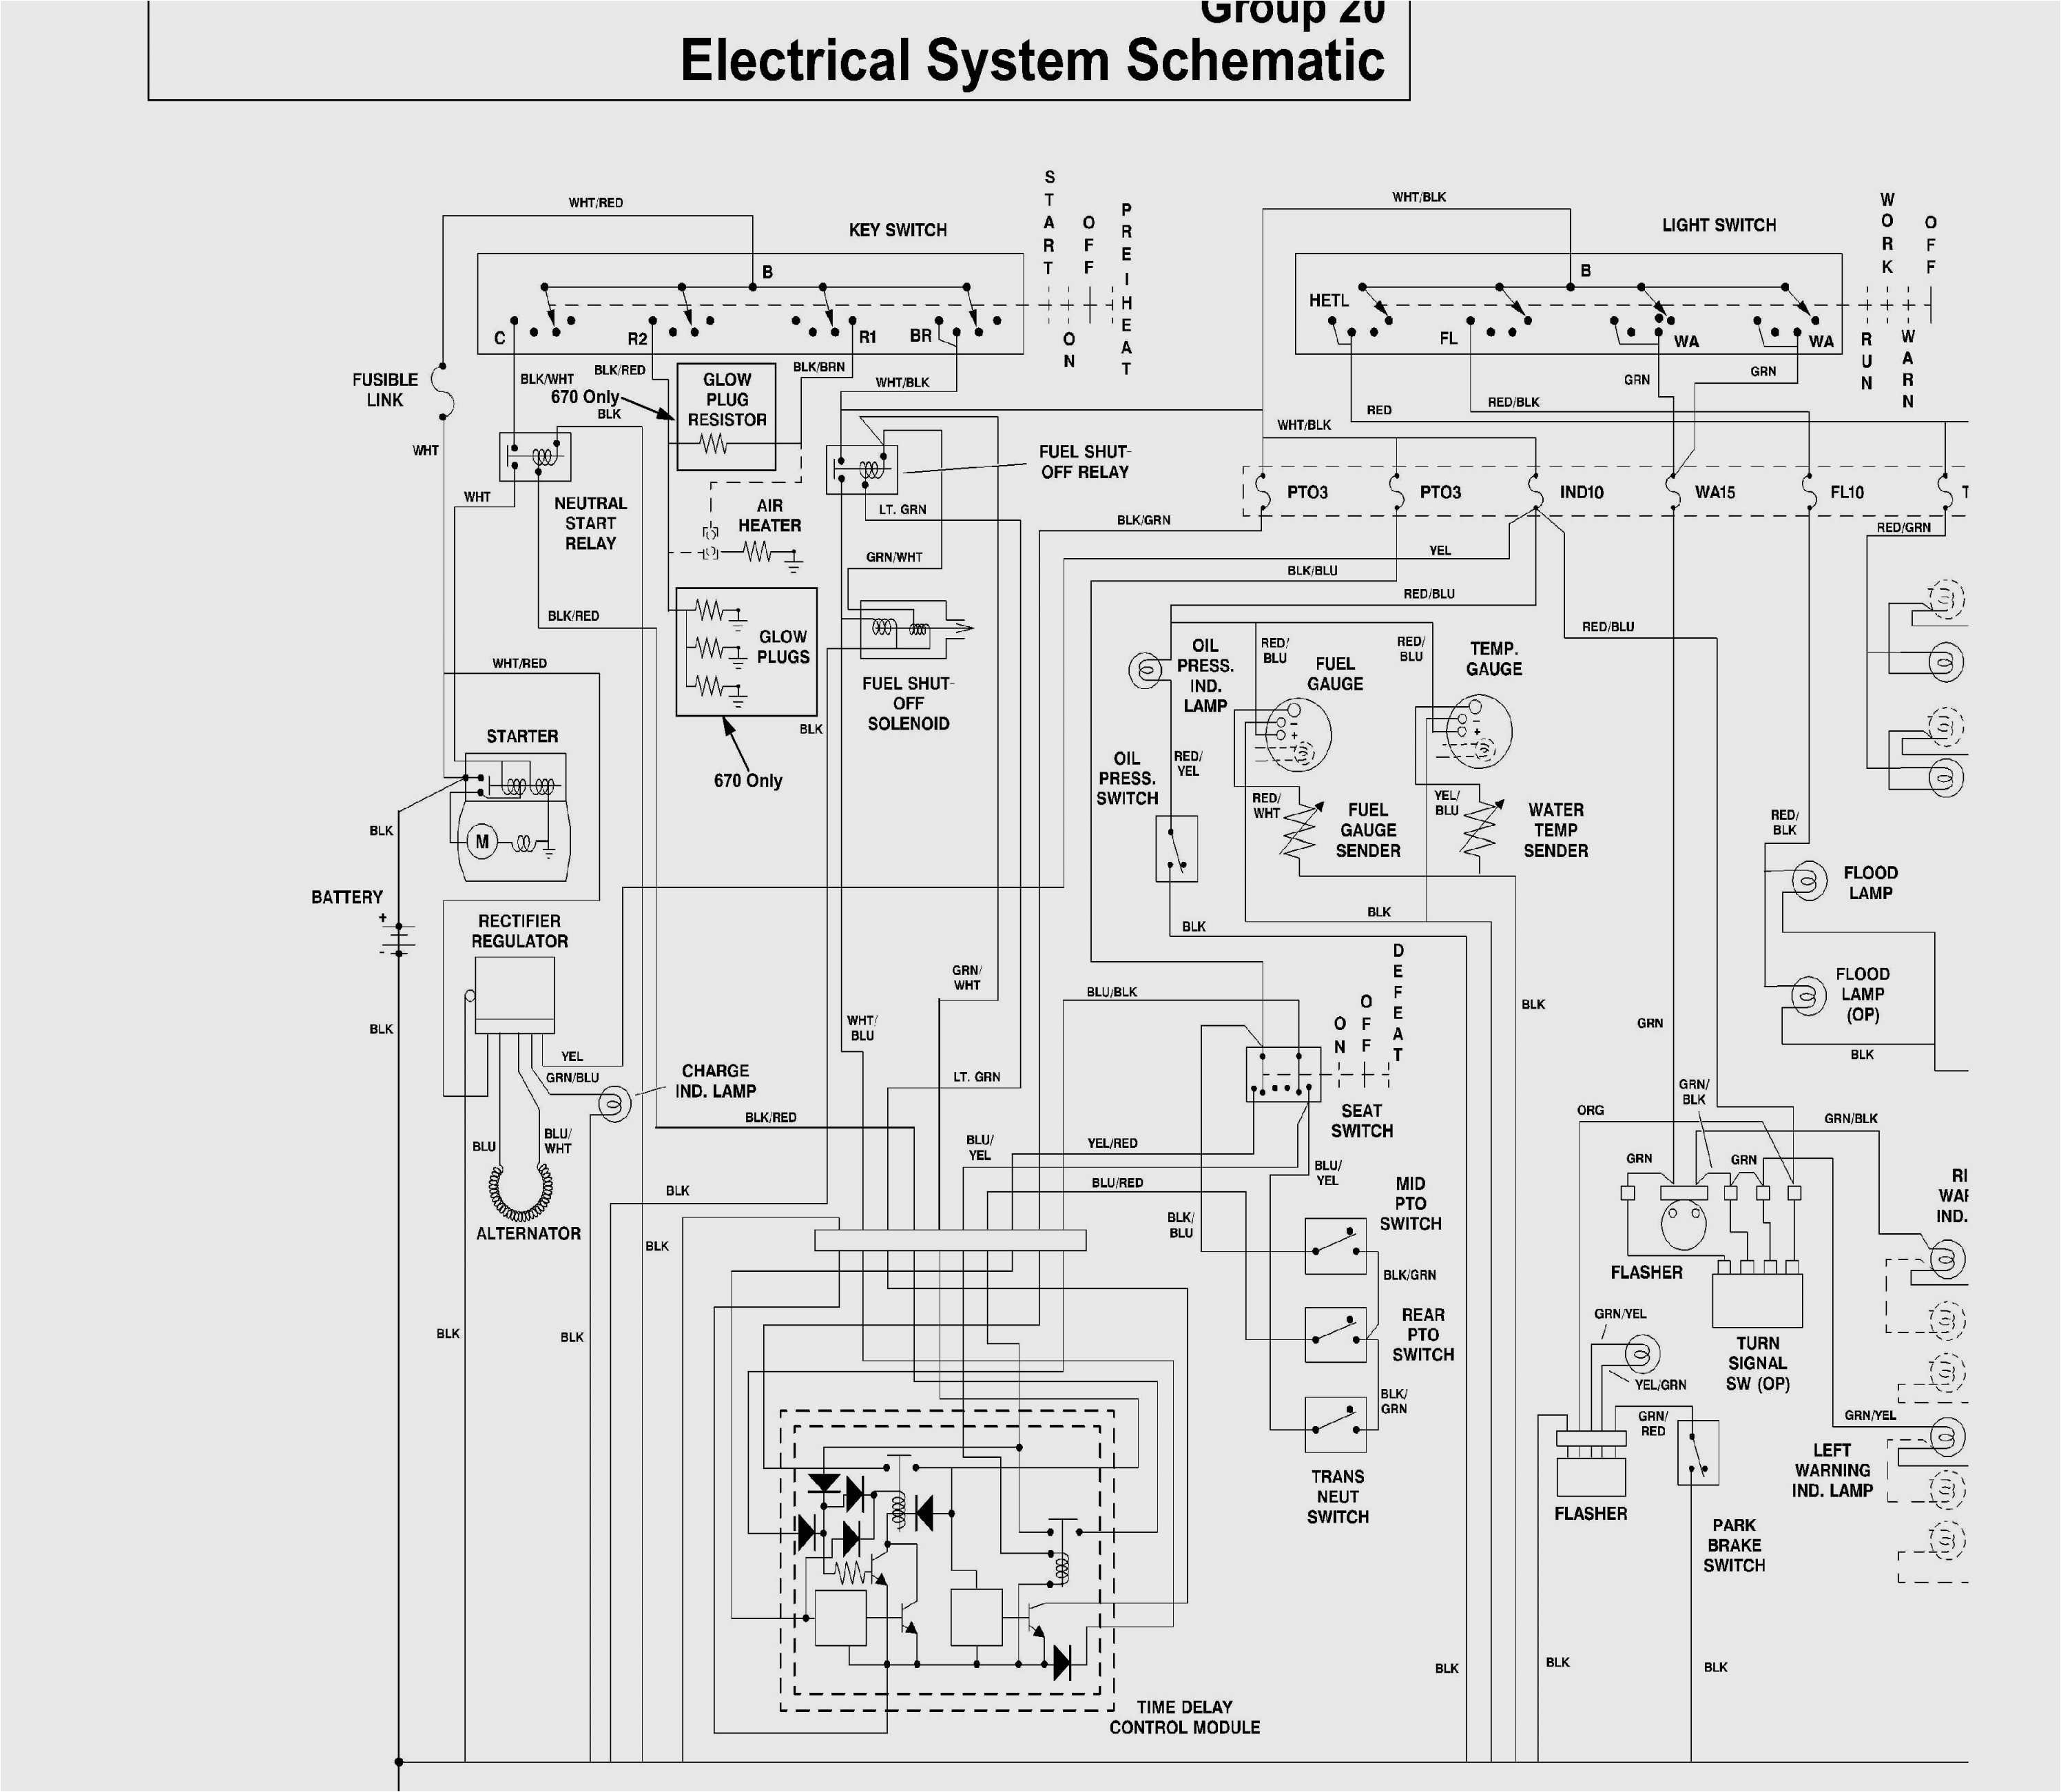 zox wiring diagram wiring diagram zox wiring diagram